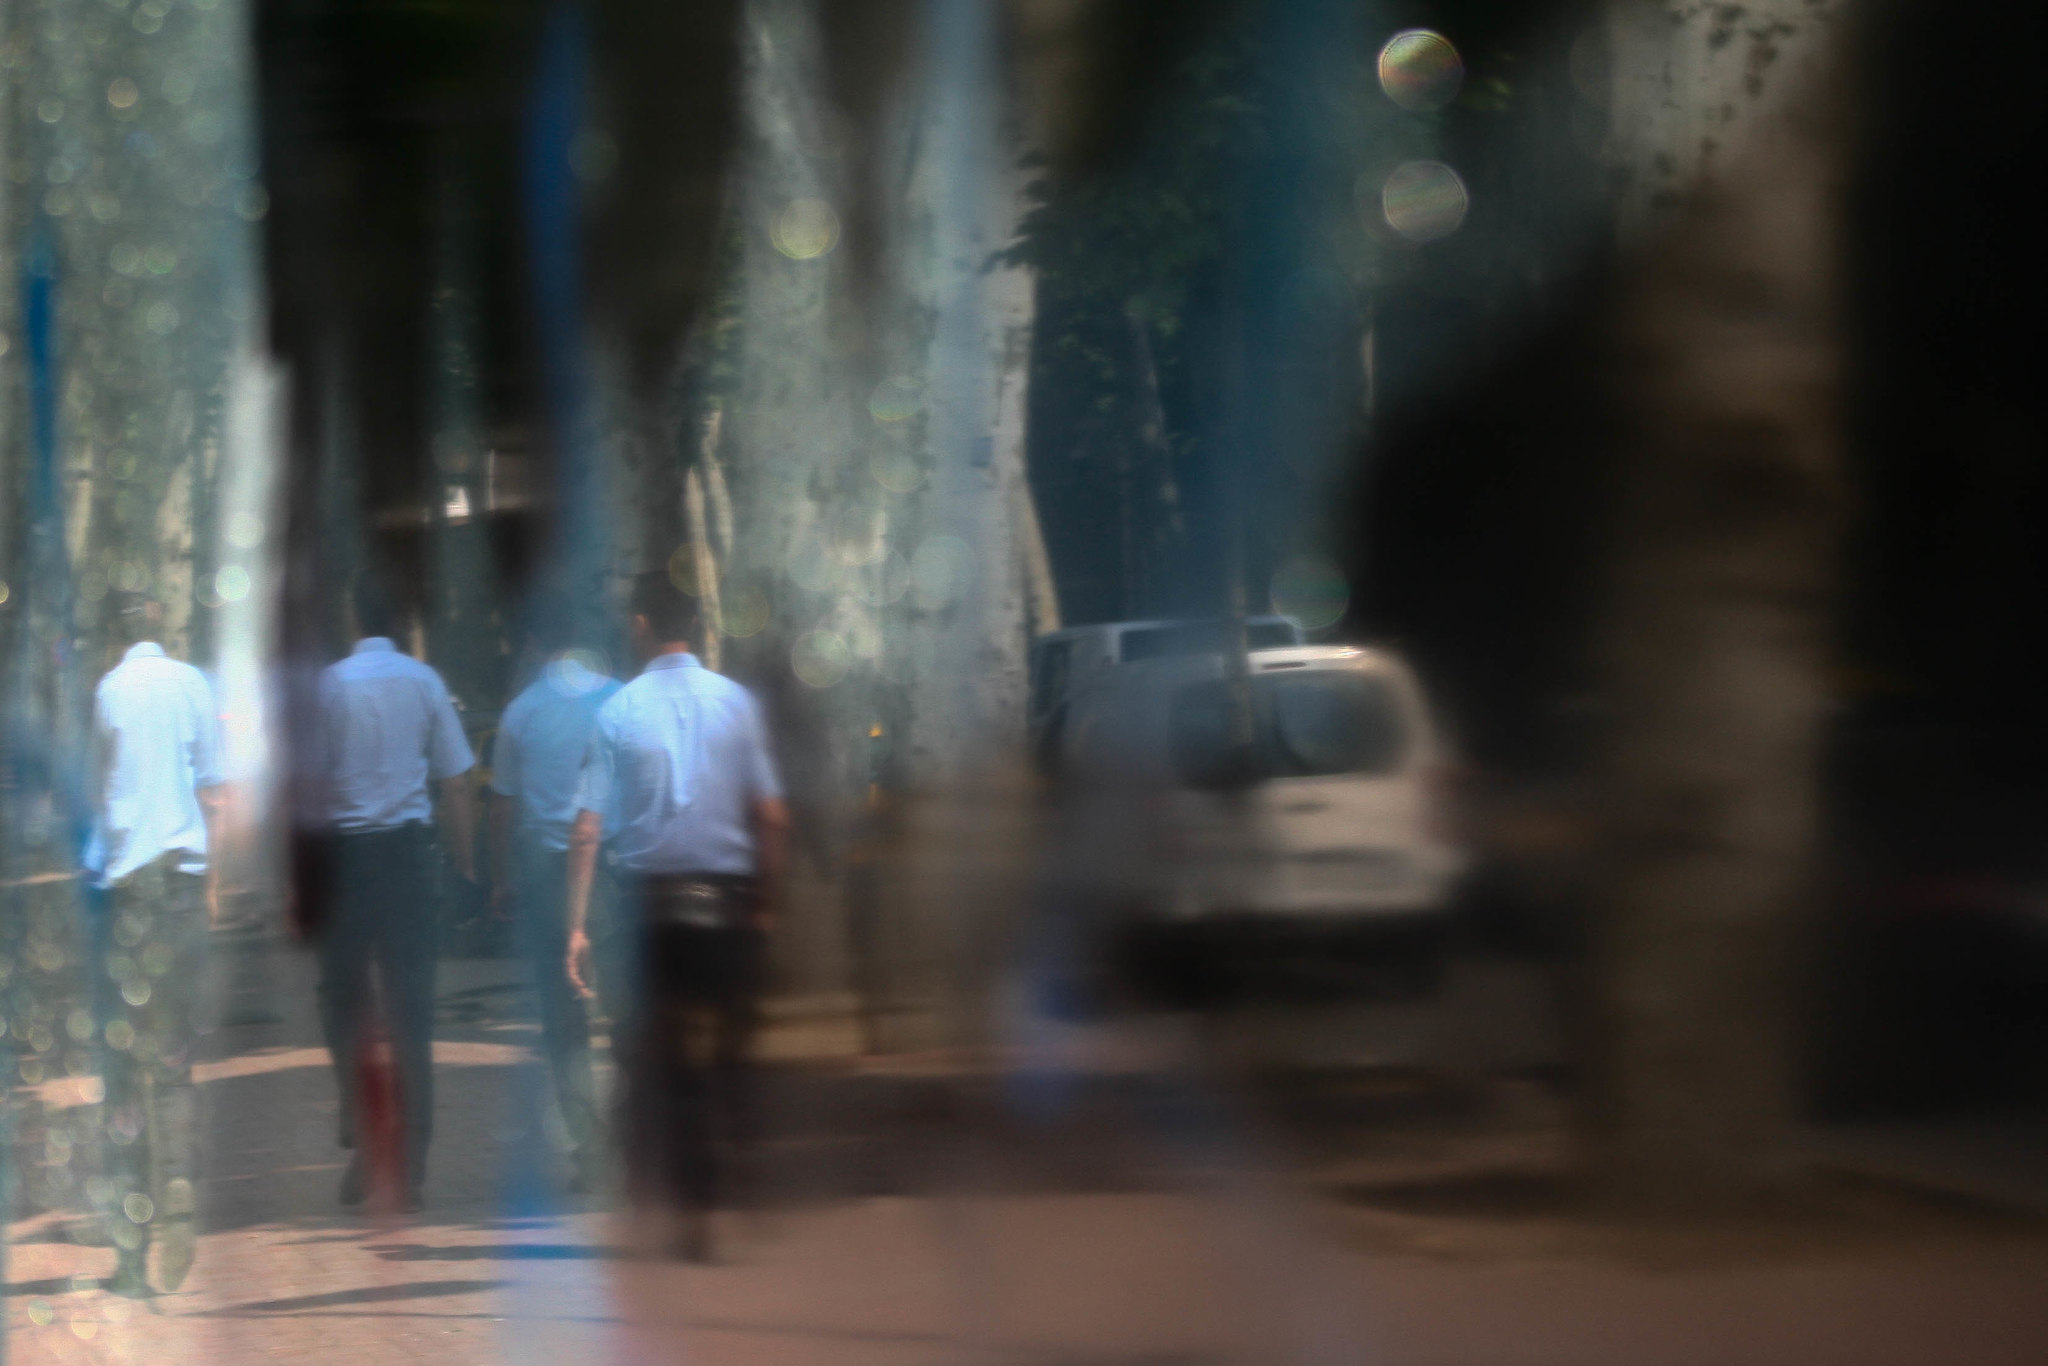 Police patrolling Dolmabahçe Caddesi.